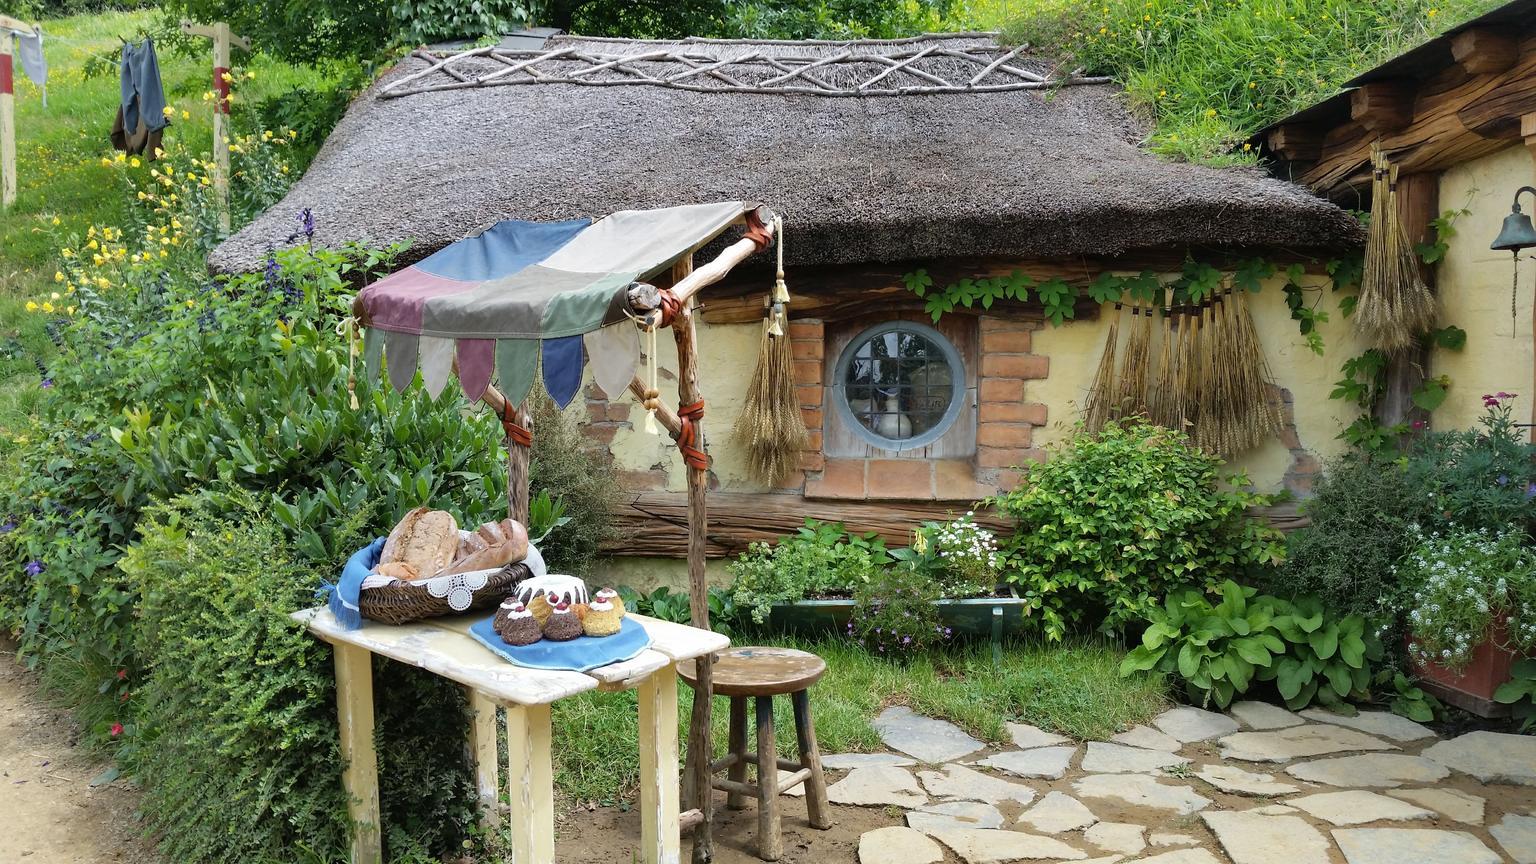 MÁS FOTOS, Tauranga Shore Excursion: Lord of the Rings Hobbiton Movie Set Tour Including Rotorua Sightseeing